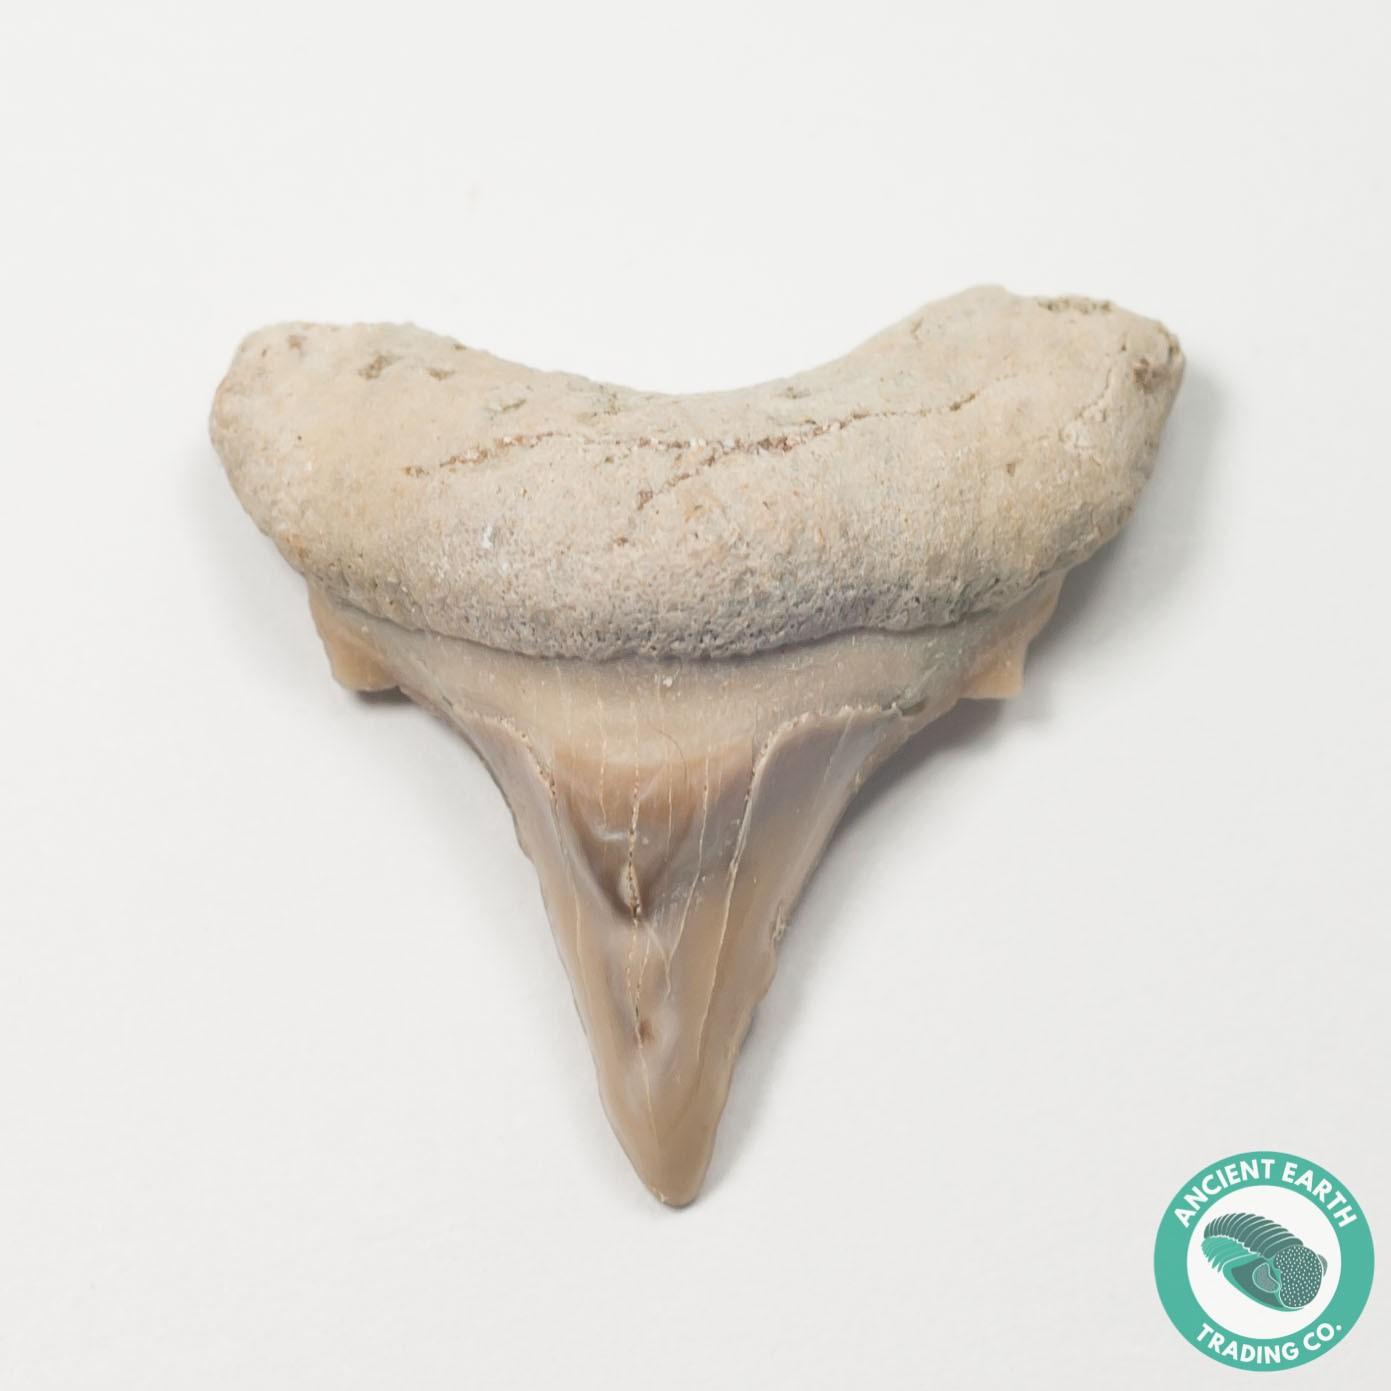 "1.01"" Pathologic Cretolamna Mackerel Shark Tooth Fossil - Morocco"